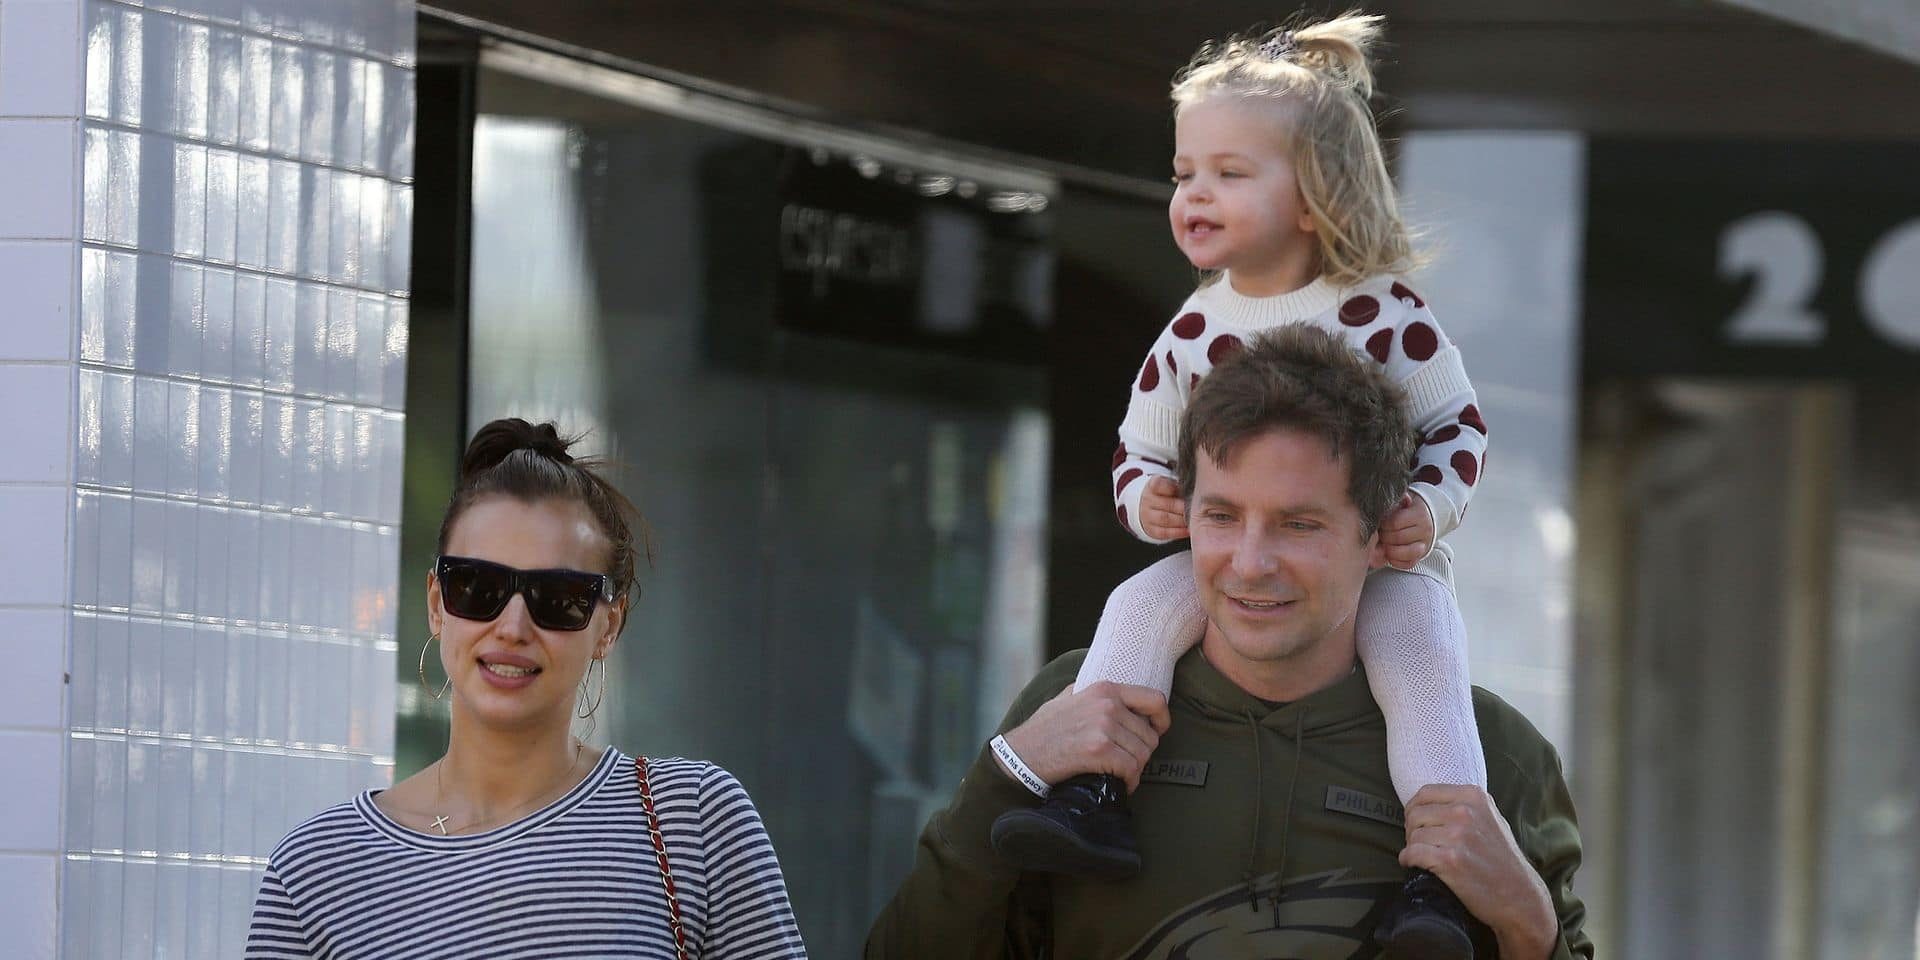 Rare sortie en famille pour Bradley Cooper, Irina Shayk et leur petite fille